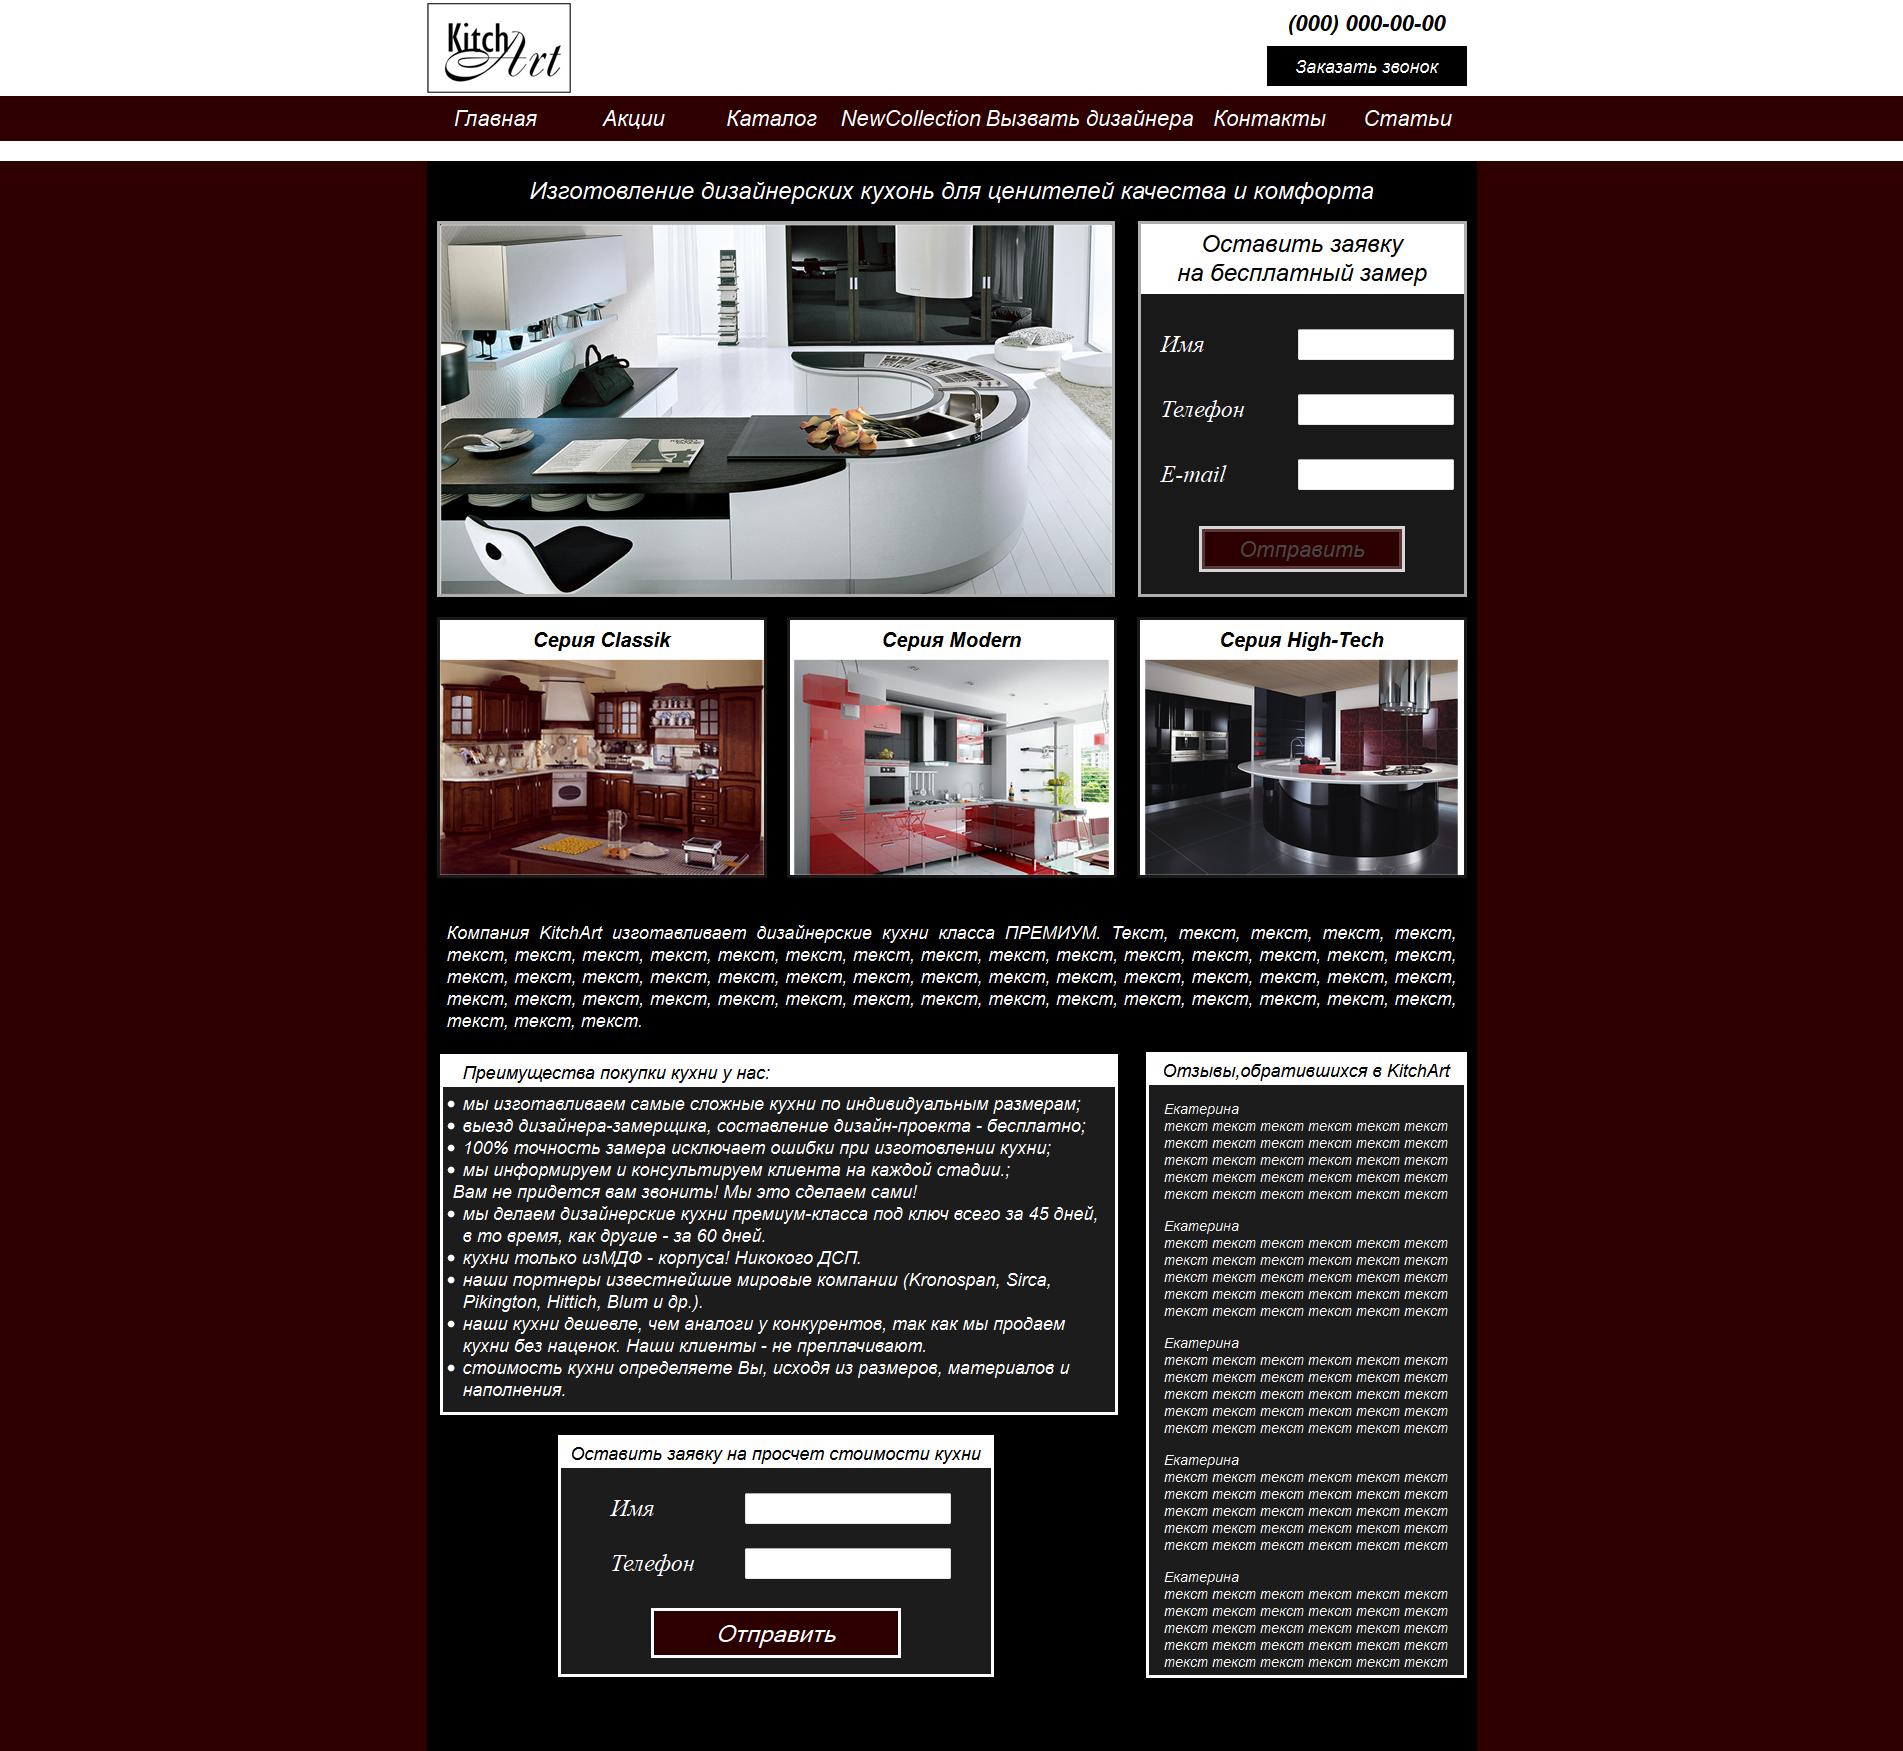 Главная страница kitchart